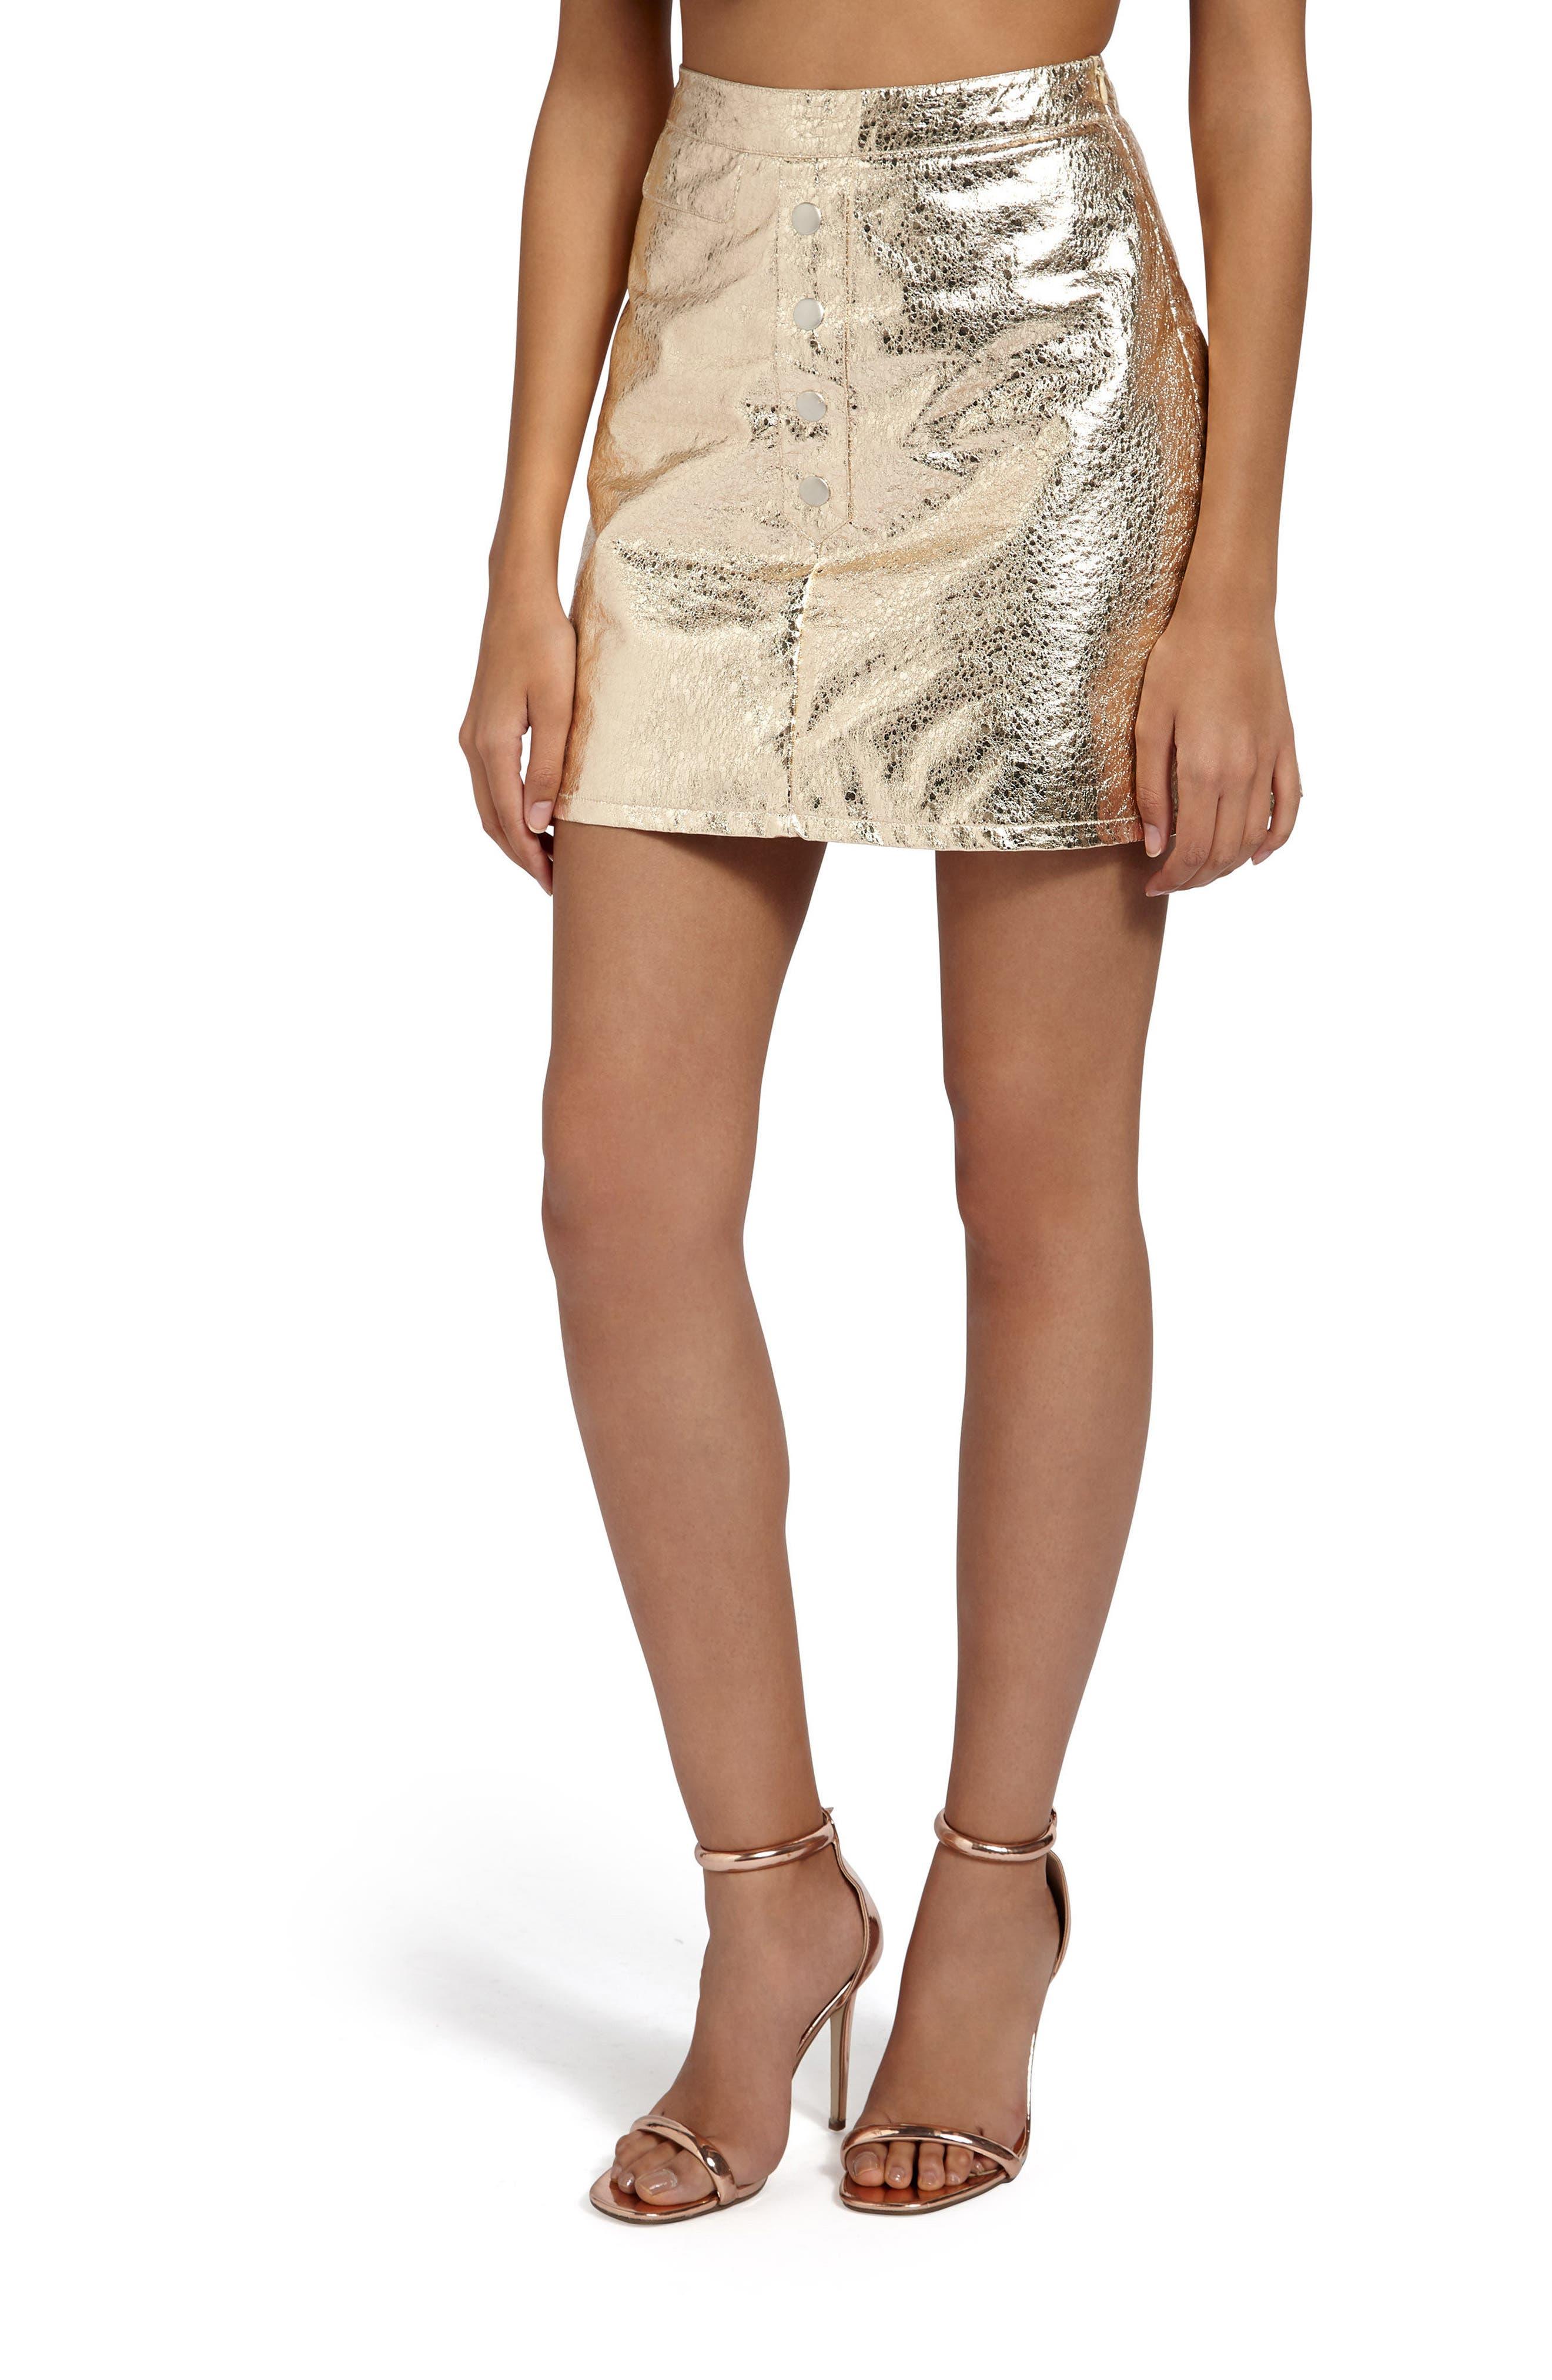 Missguided Crackled Metallic Miniskirt